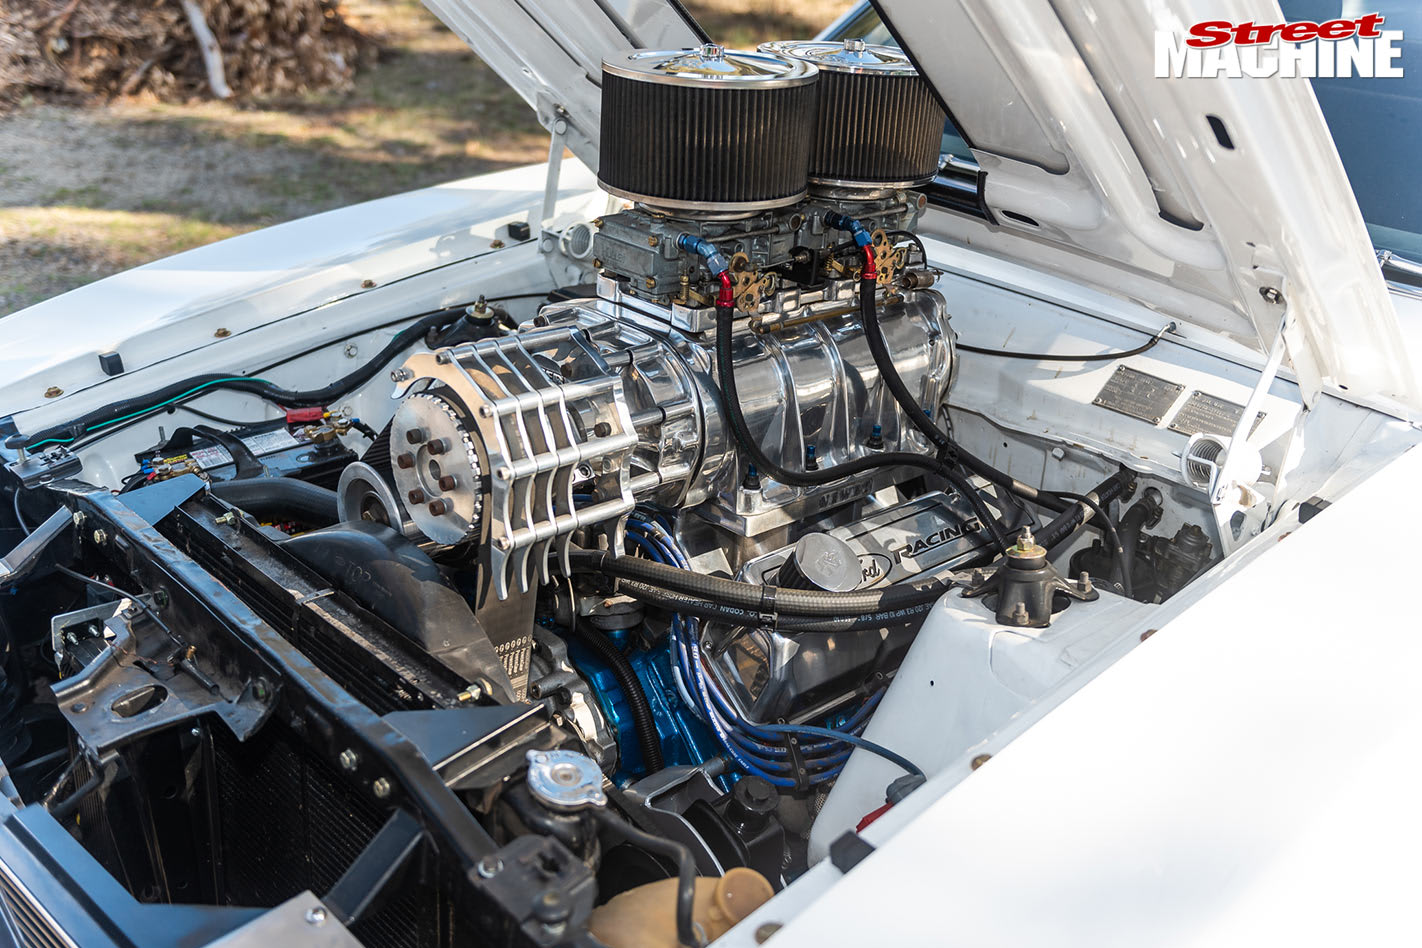 Ford XC ute engine bay